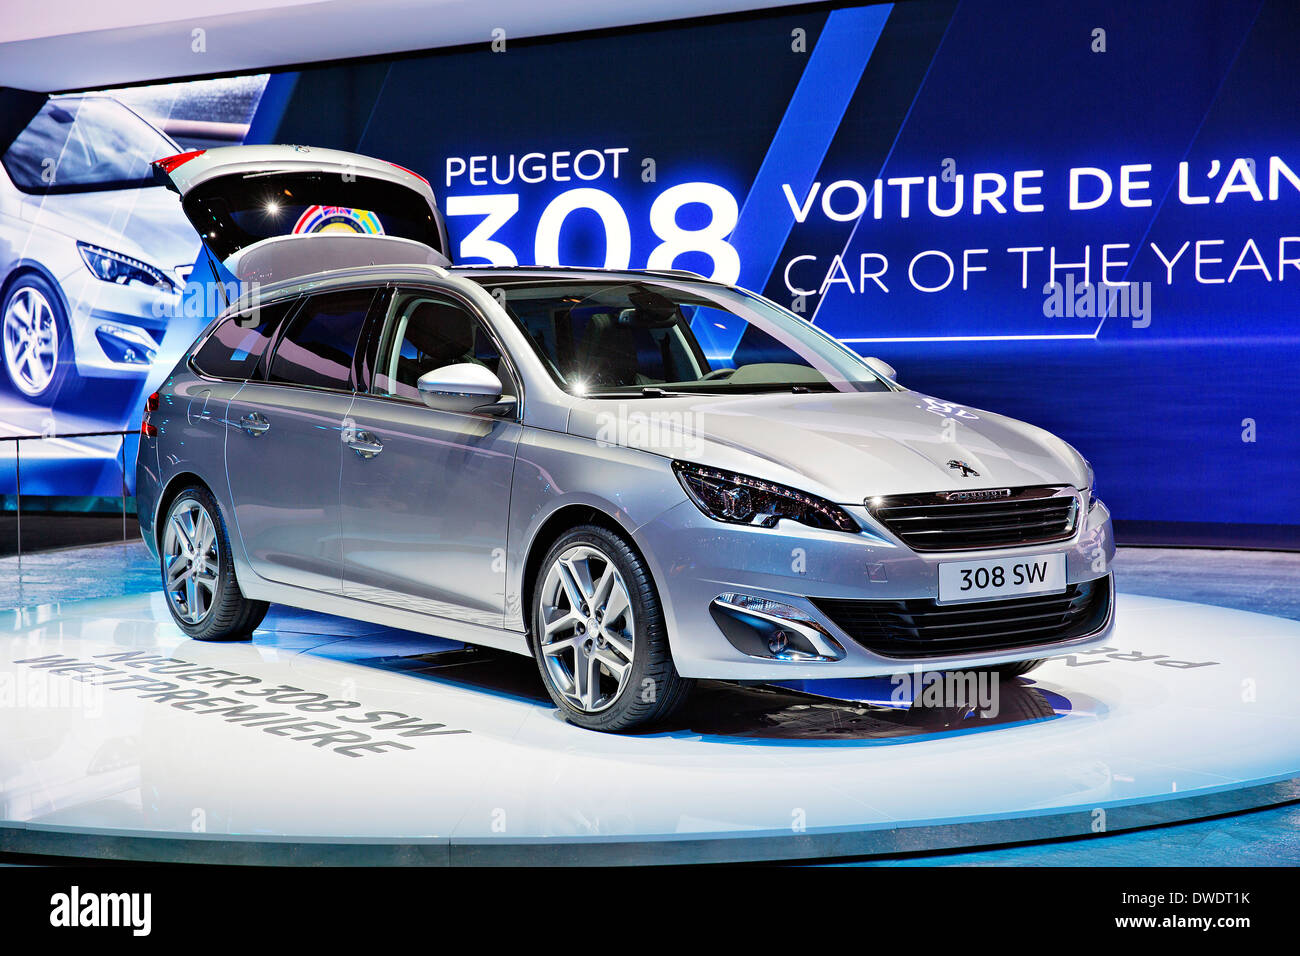 Peugeot 308 SW - Stock Image